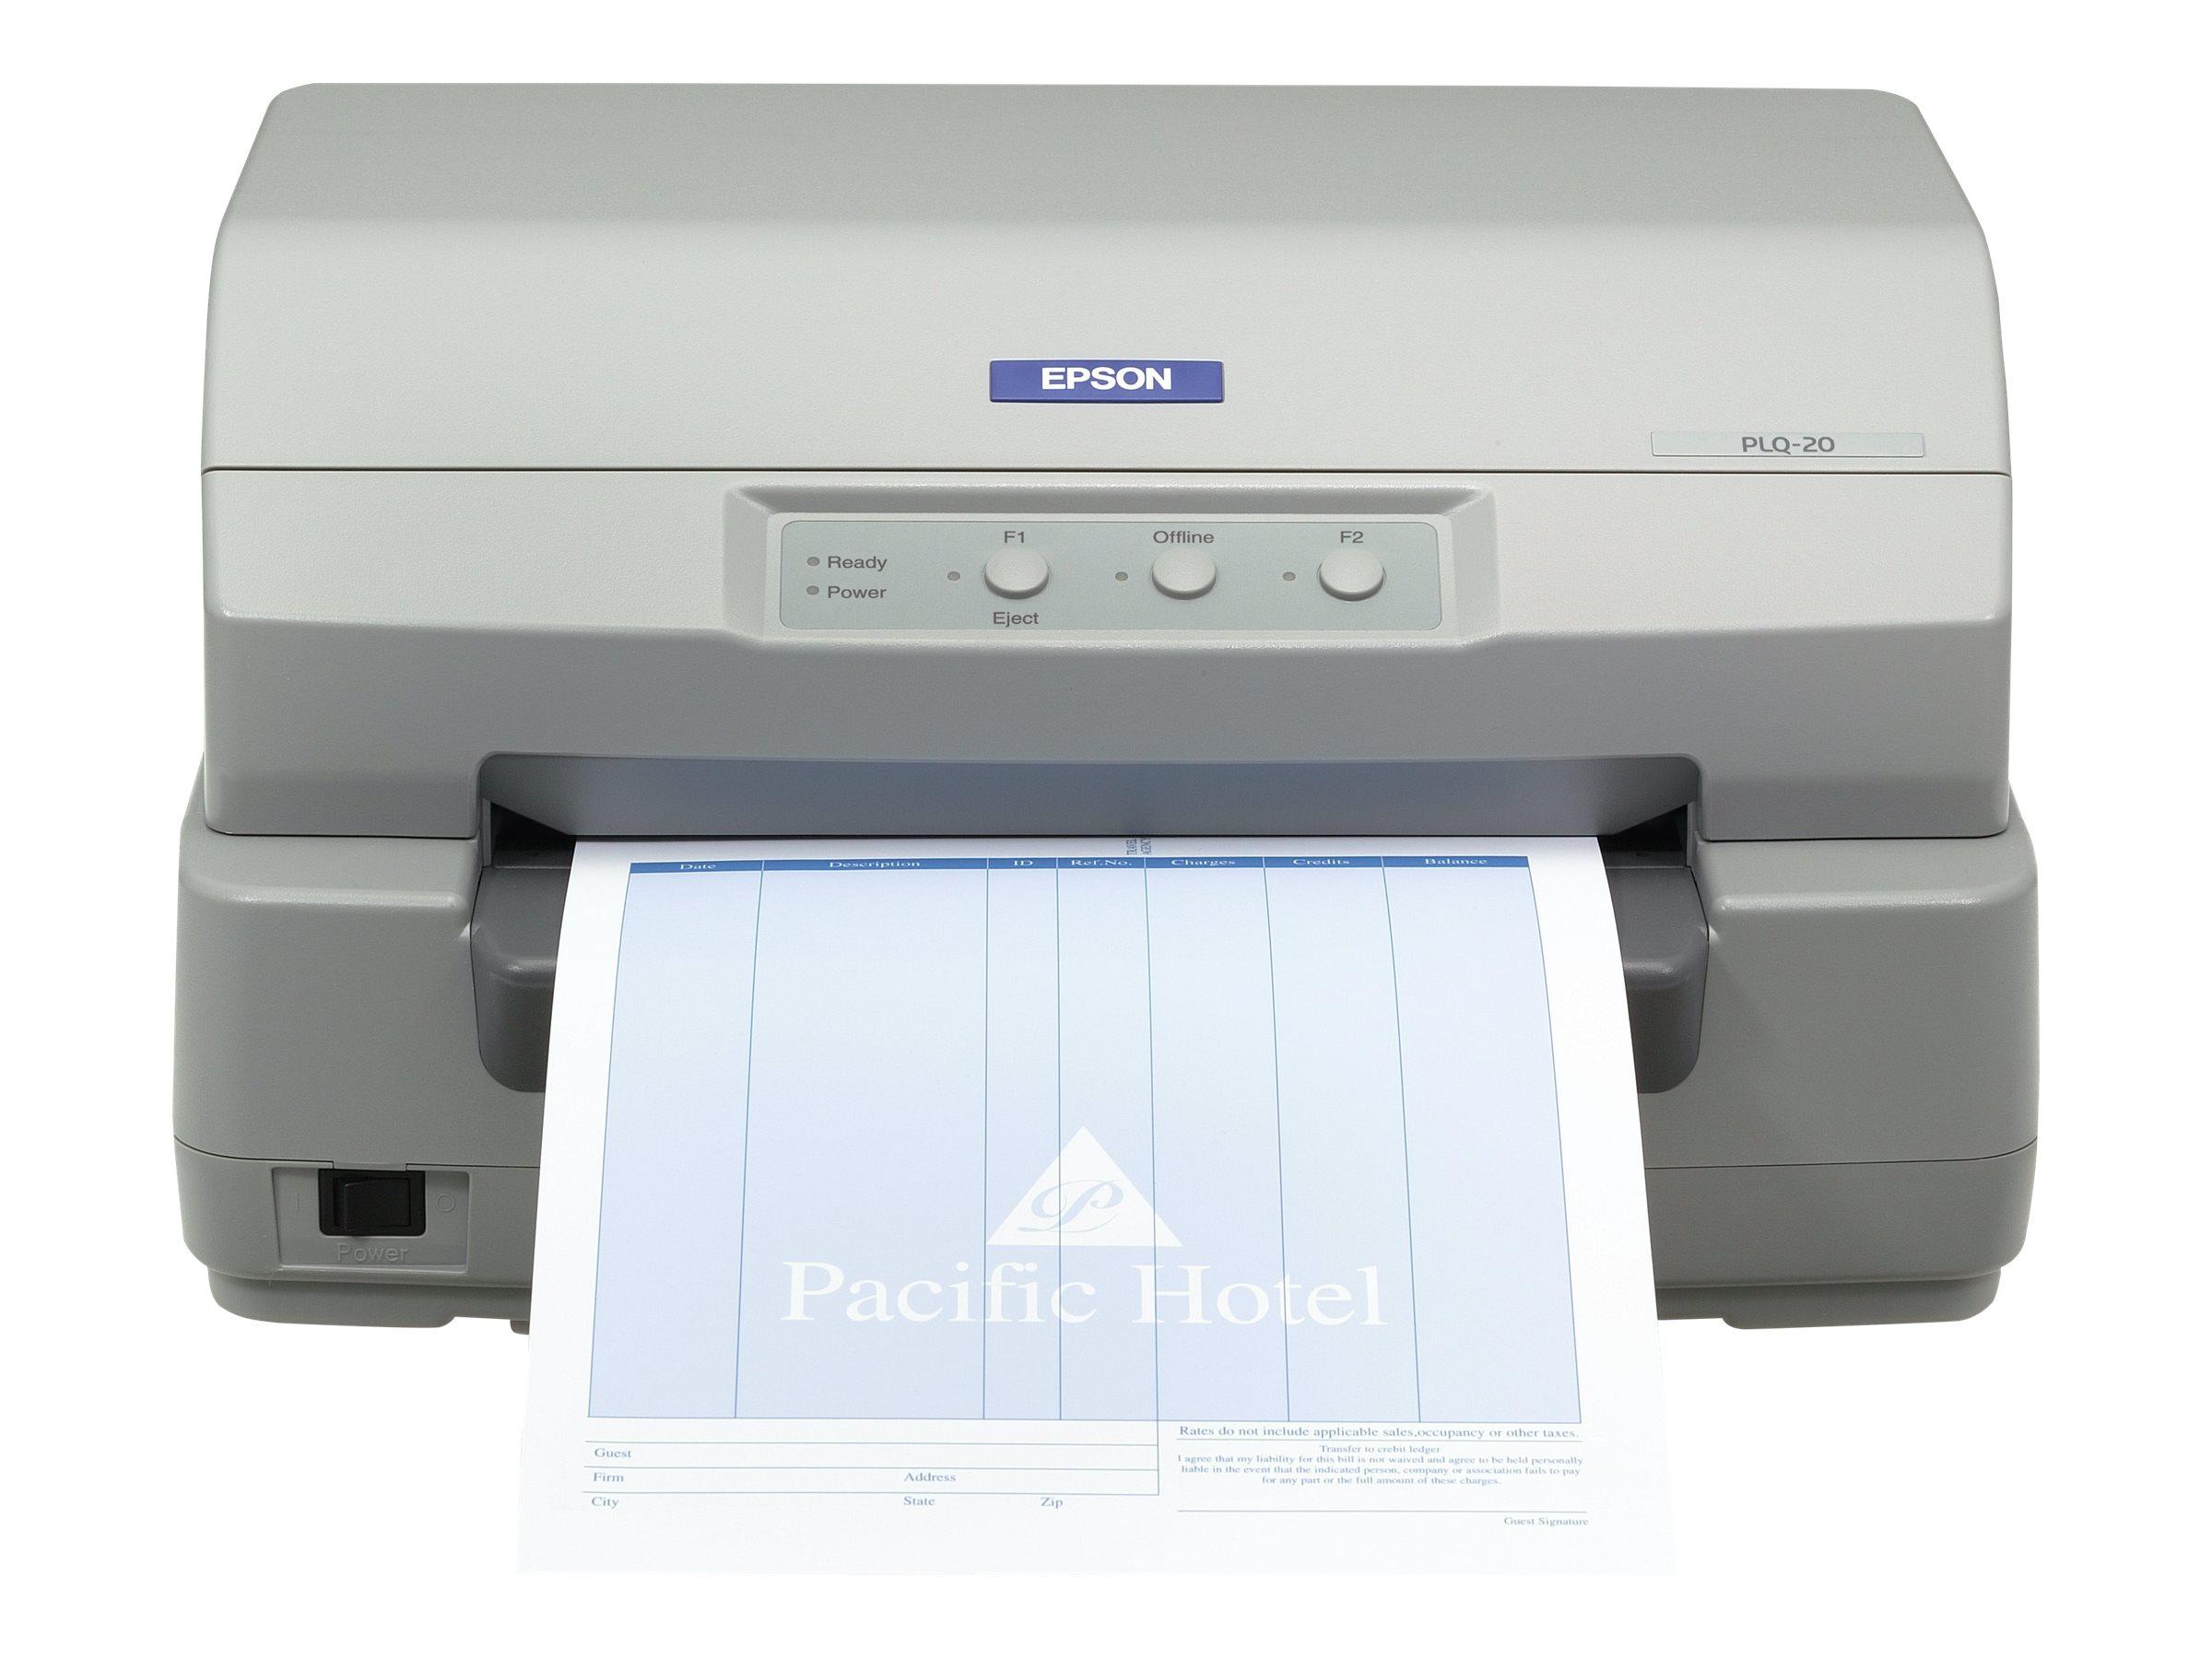 Epson PLQ 20 - Sparbuchdrucker - monochrom - Punktmatrix - 245 x 297 mm - 24 Pin